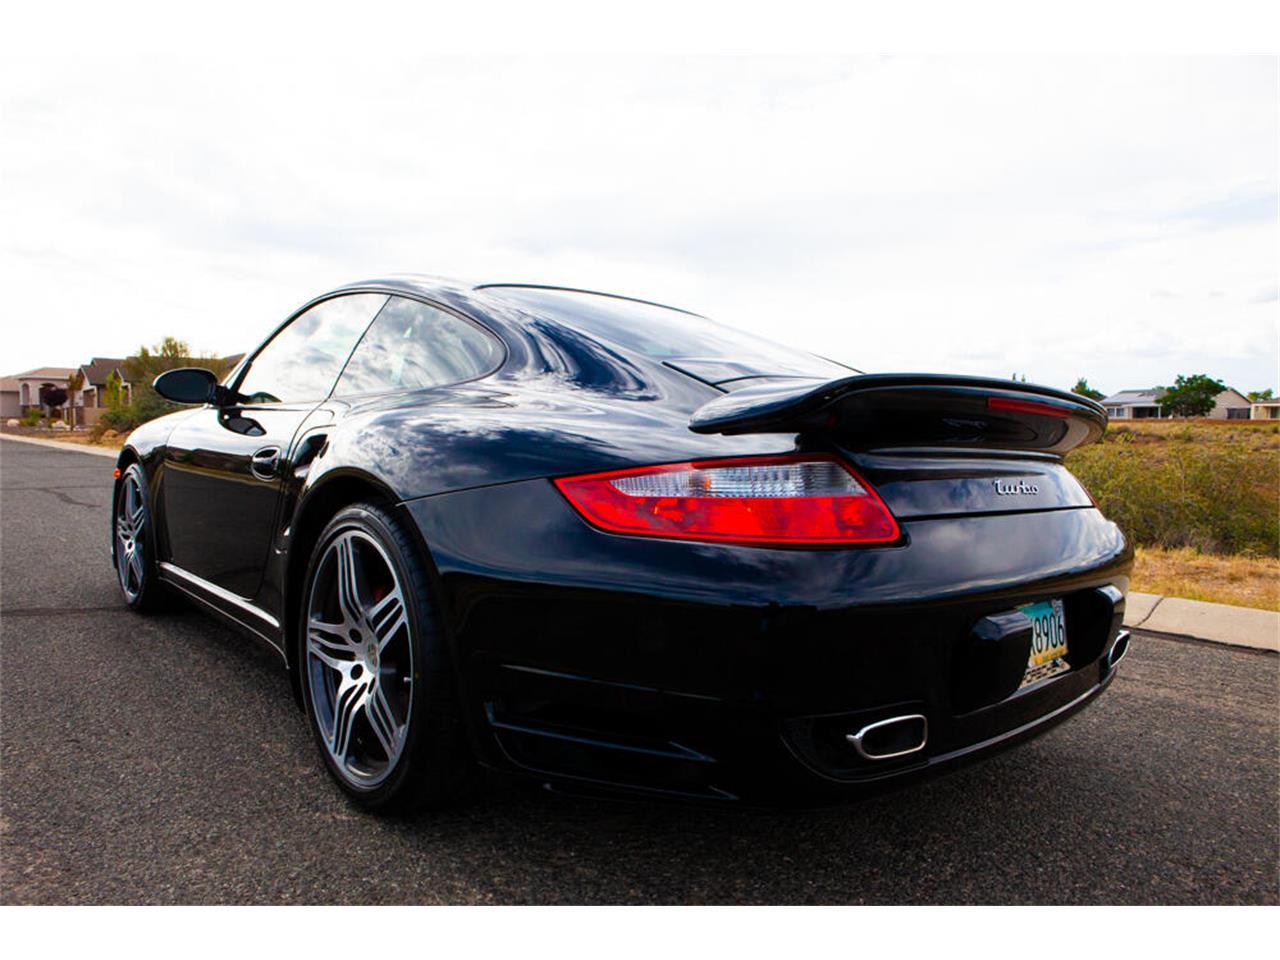 2008 Porsche 911 Turbo (CC-1394248) for sale in Groveland, California